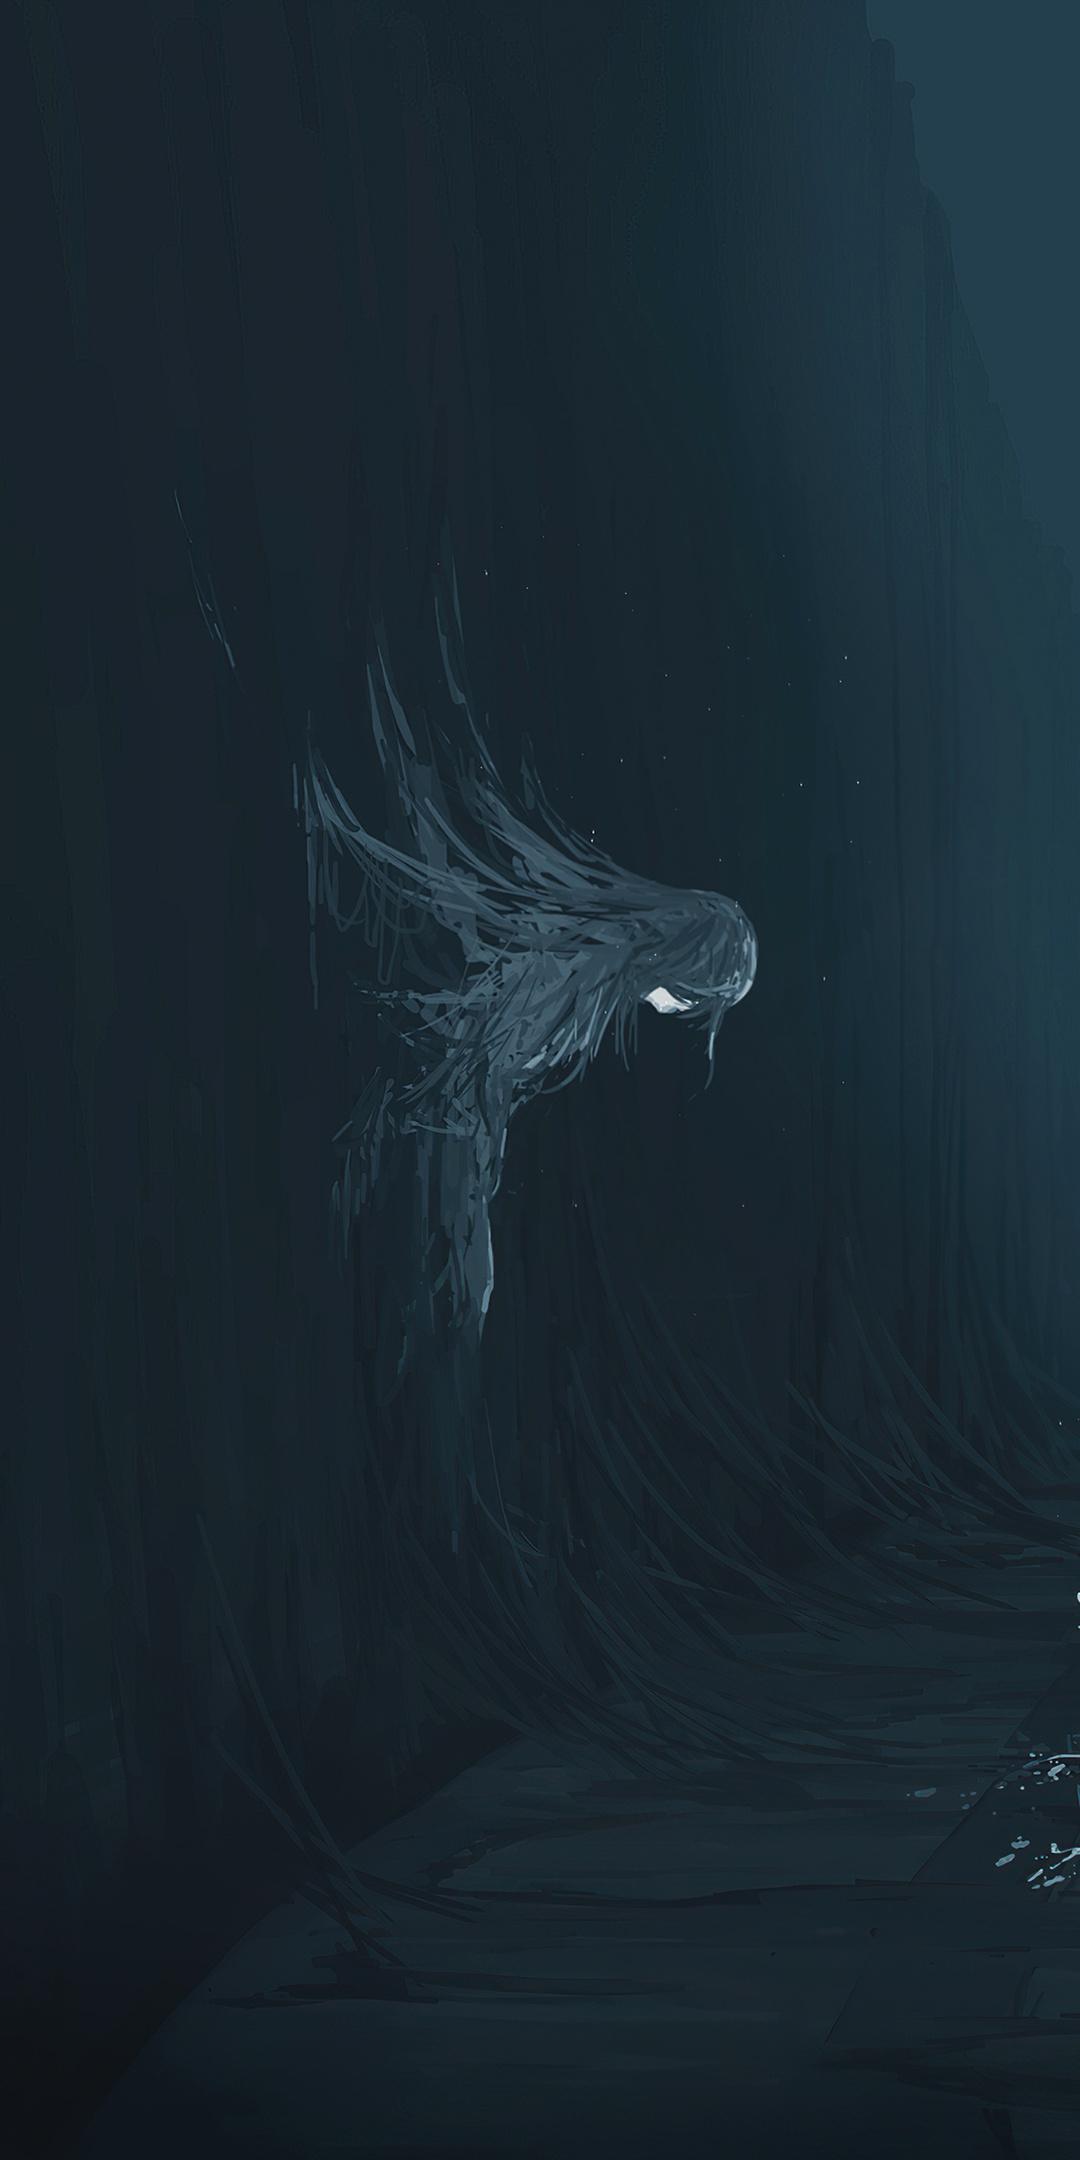 anime-dark-witch-nm.jpg